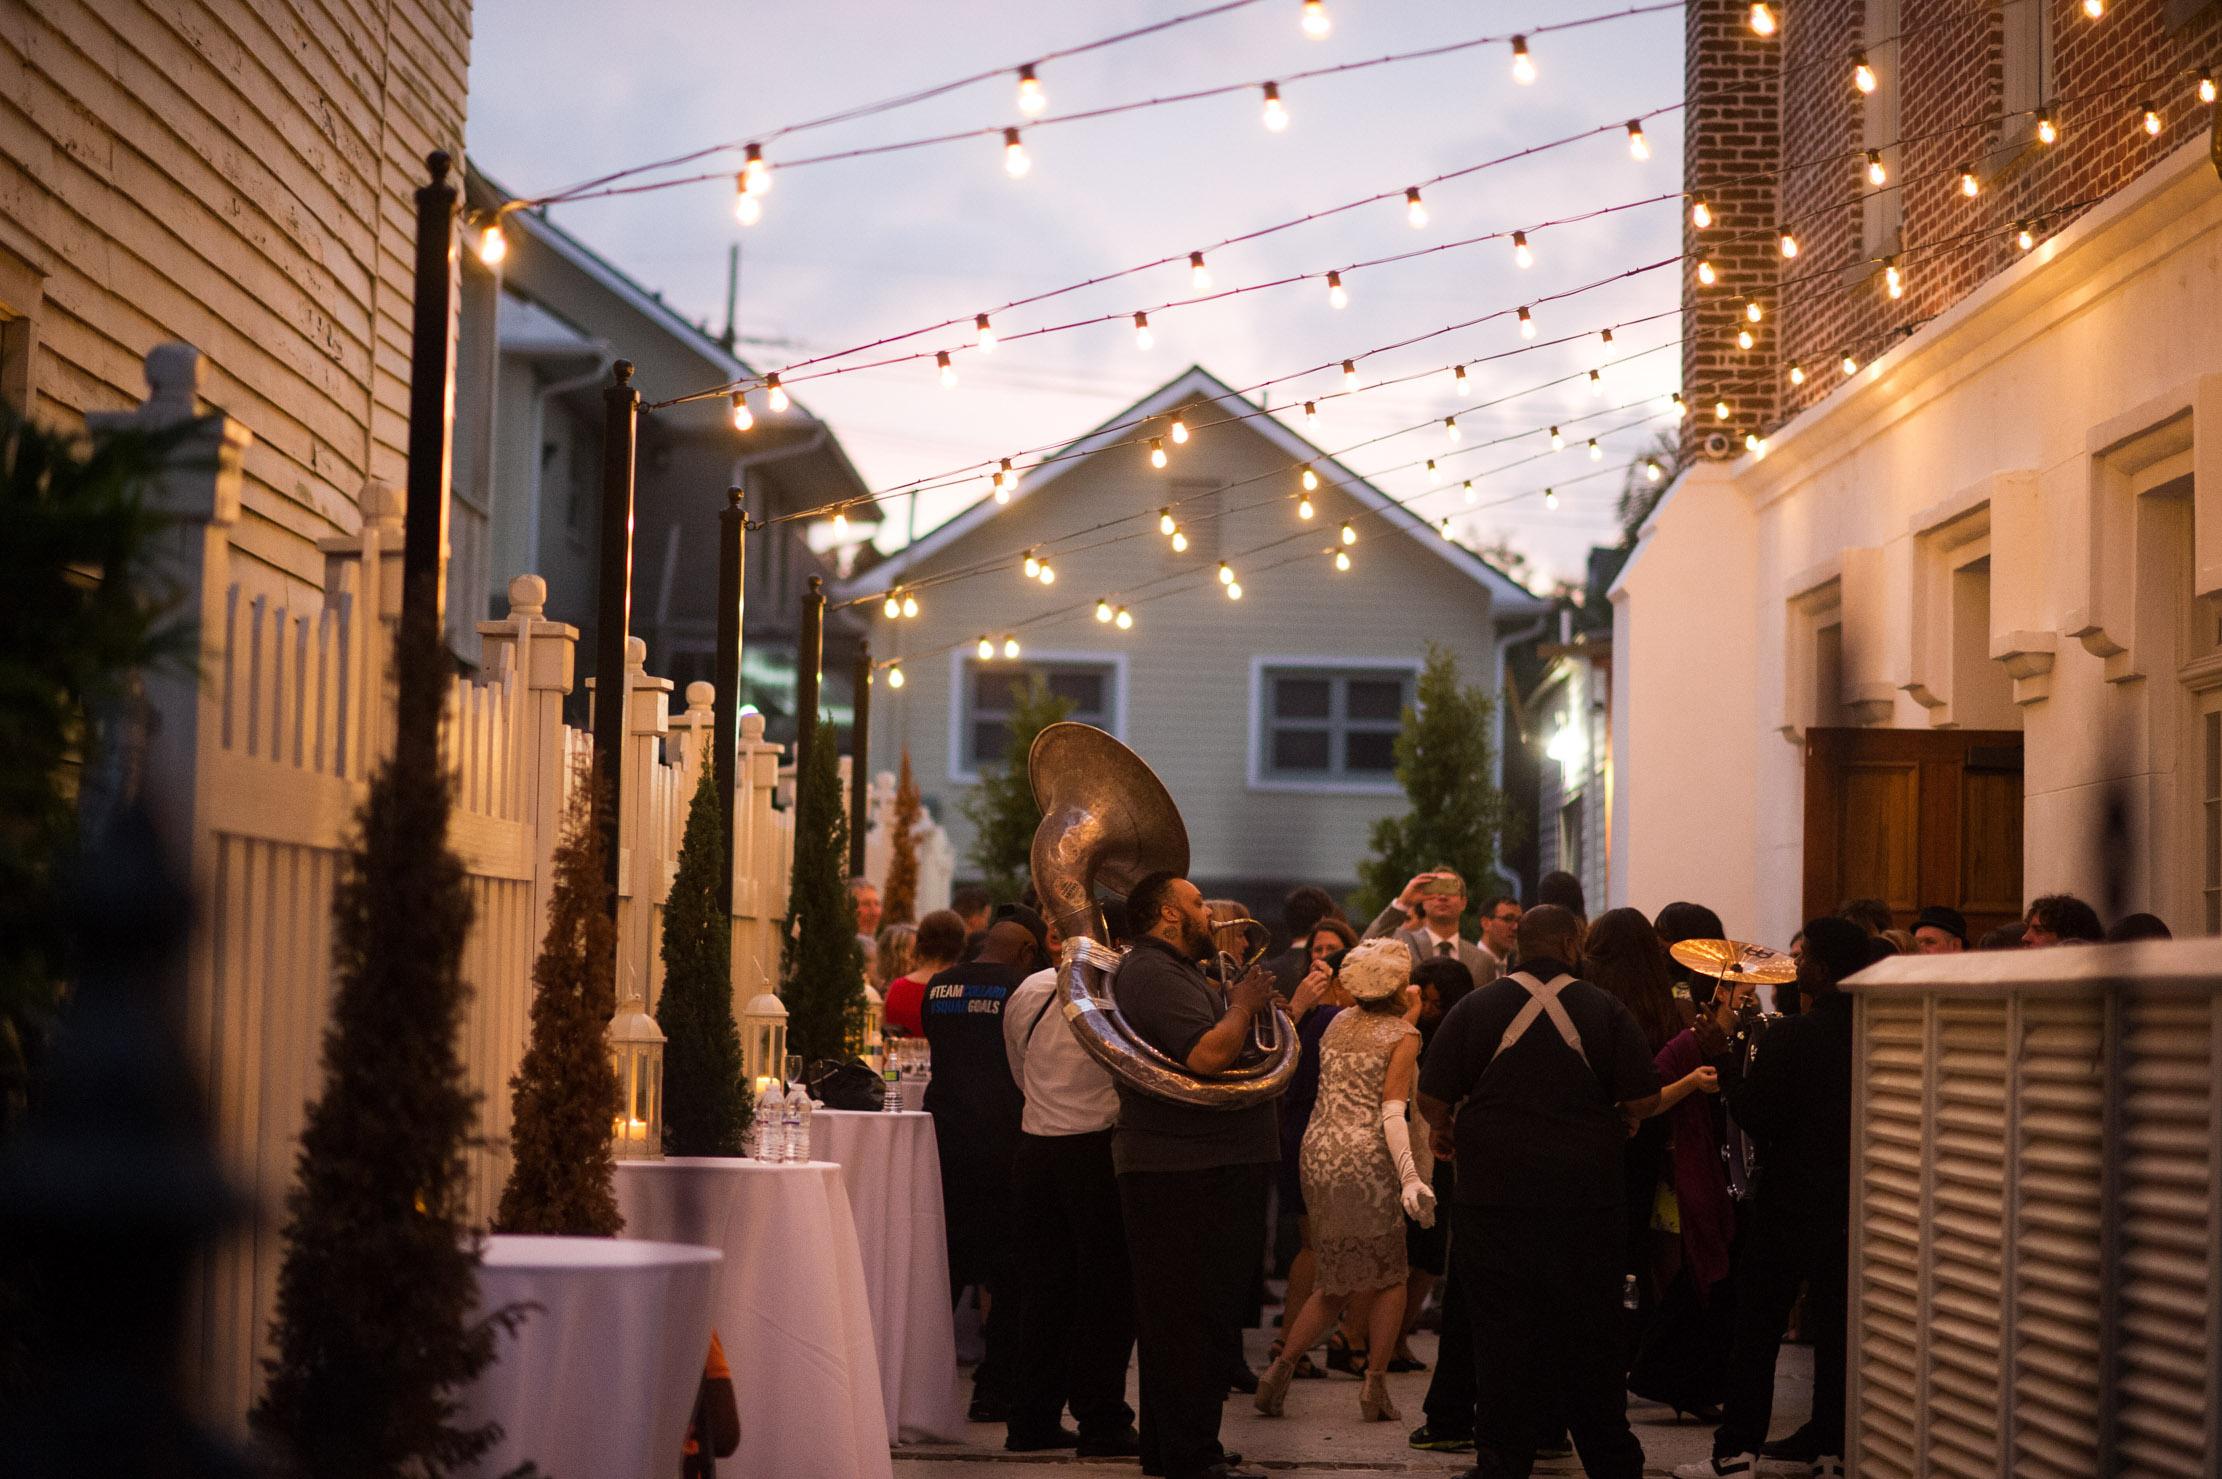 NOLA-Felicity-Church-Ace-Hotel-Wedding-1104.jpg